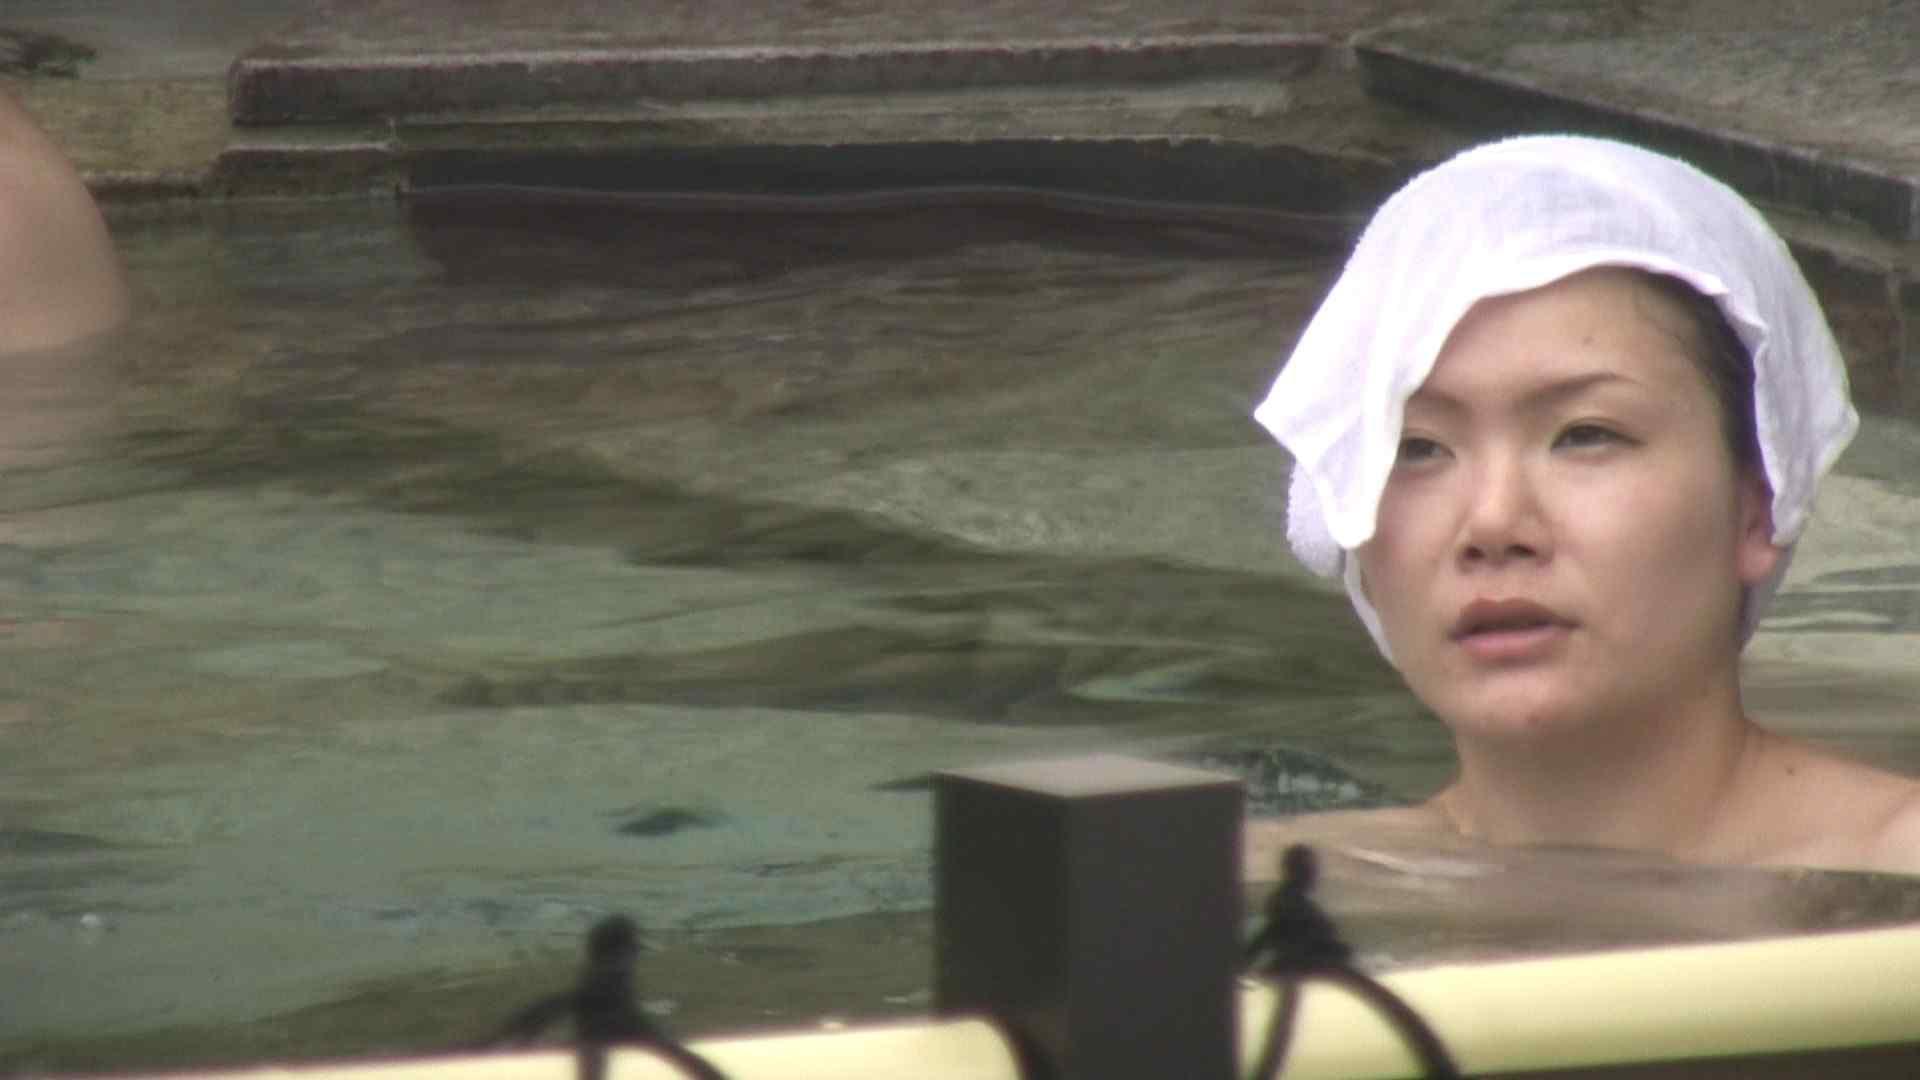 Aquaな露天風呂Vol.12【VIP】 HなOL | 盗撮  83pic 77